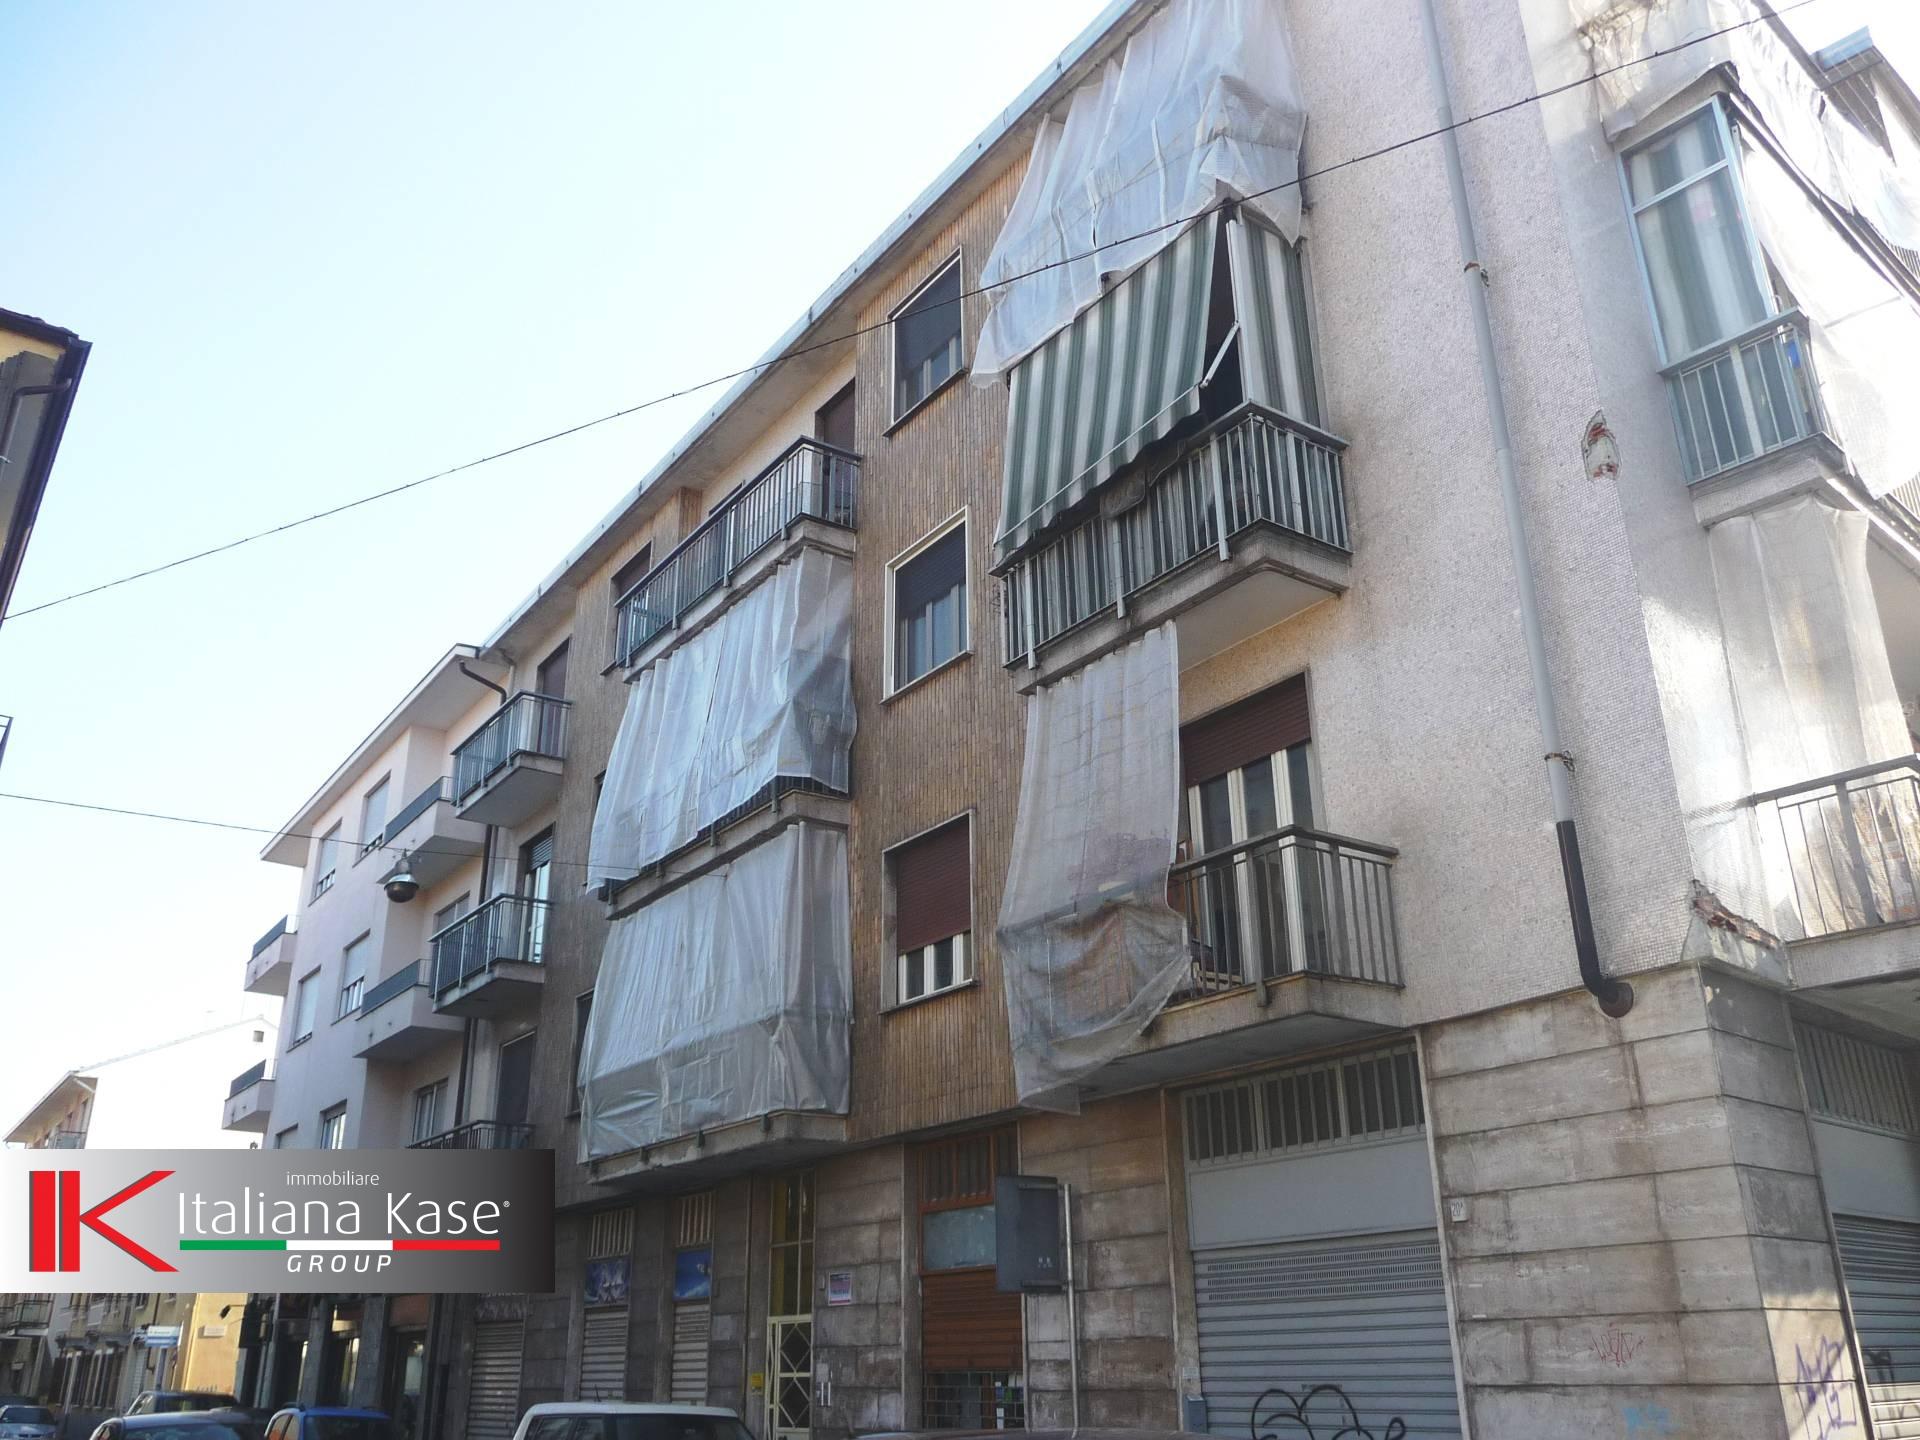 Bilocale Settimo Torinese Via Giuseppe Verdi 10